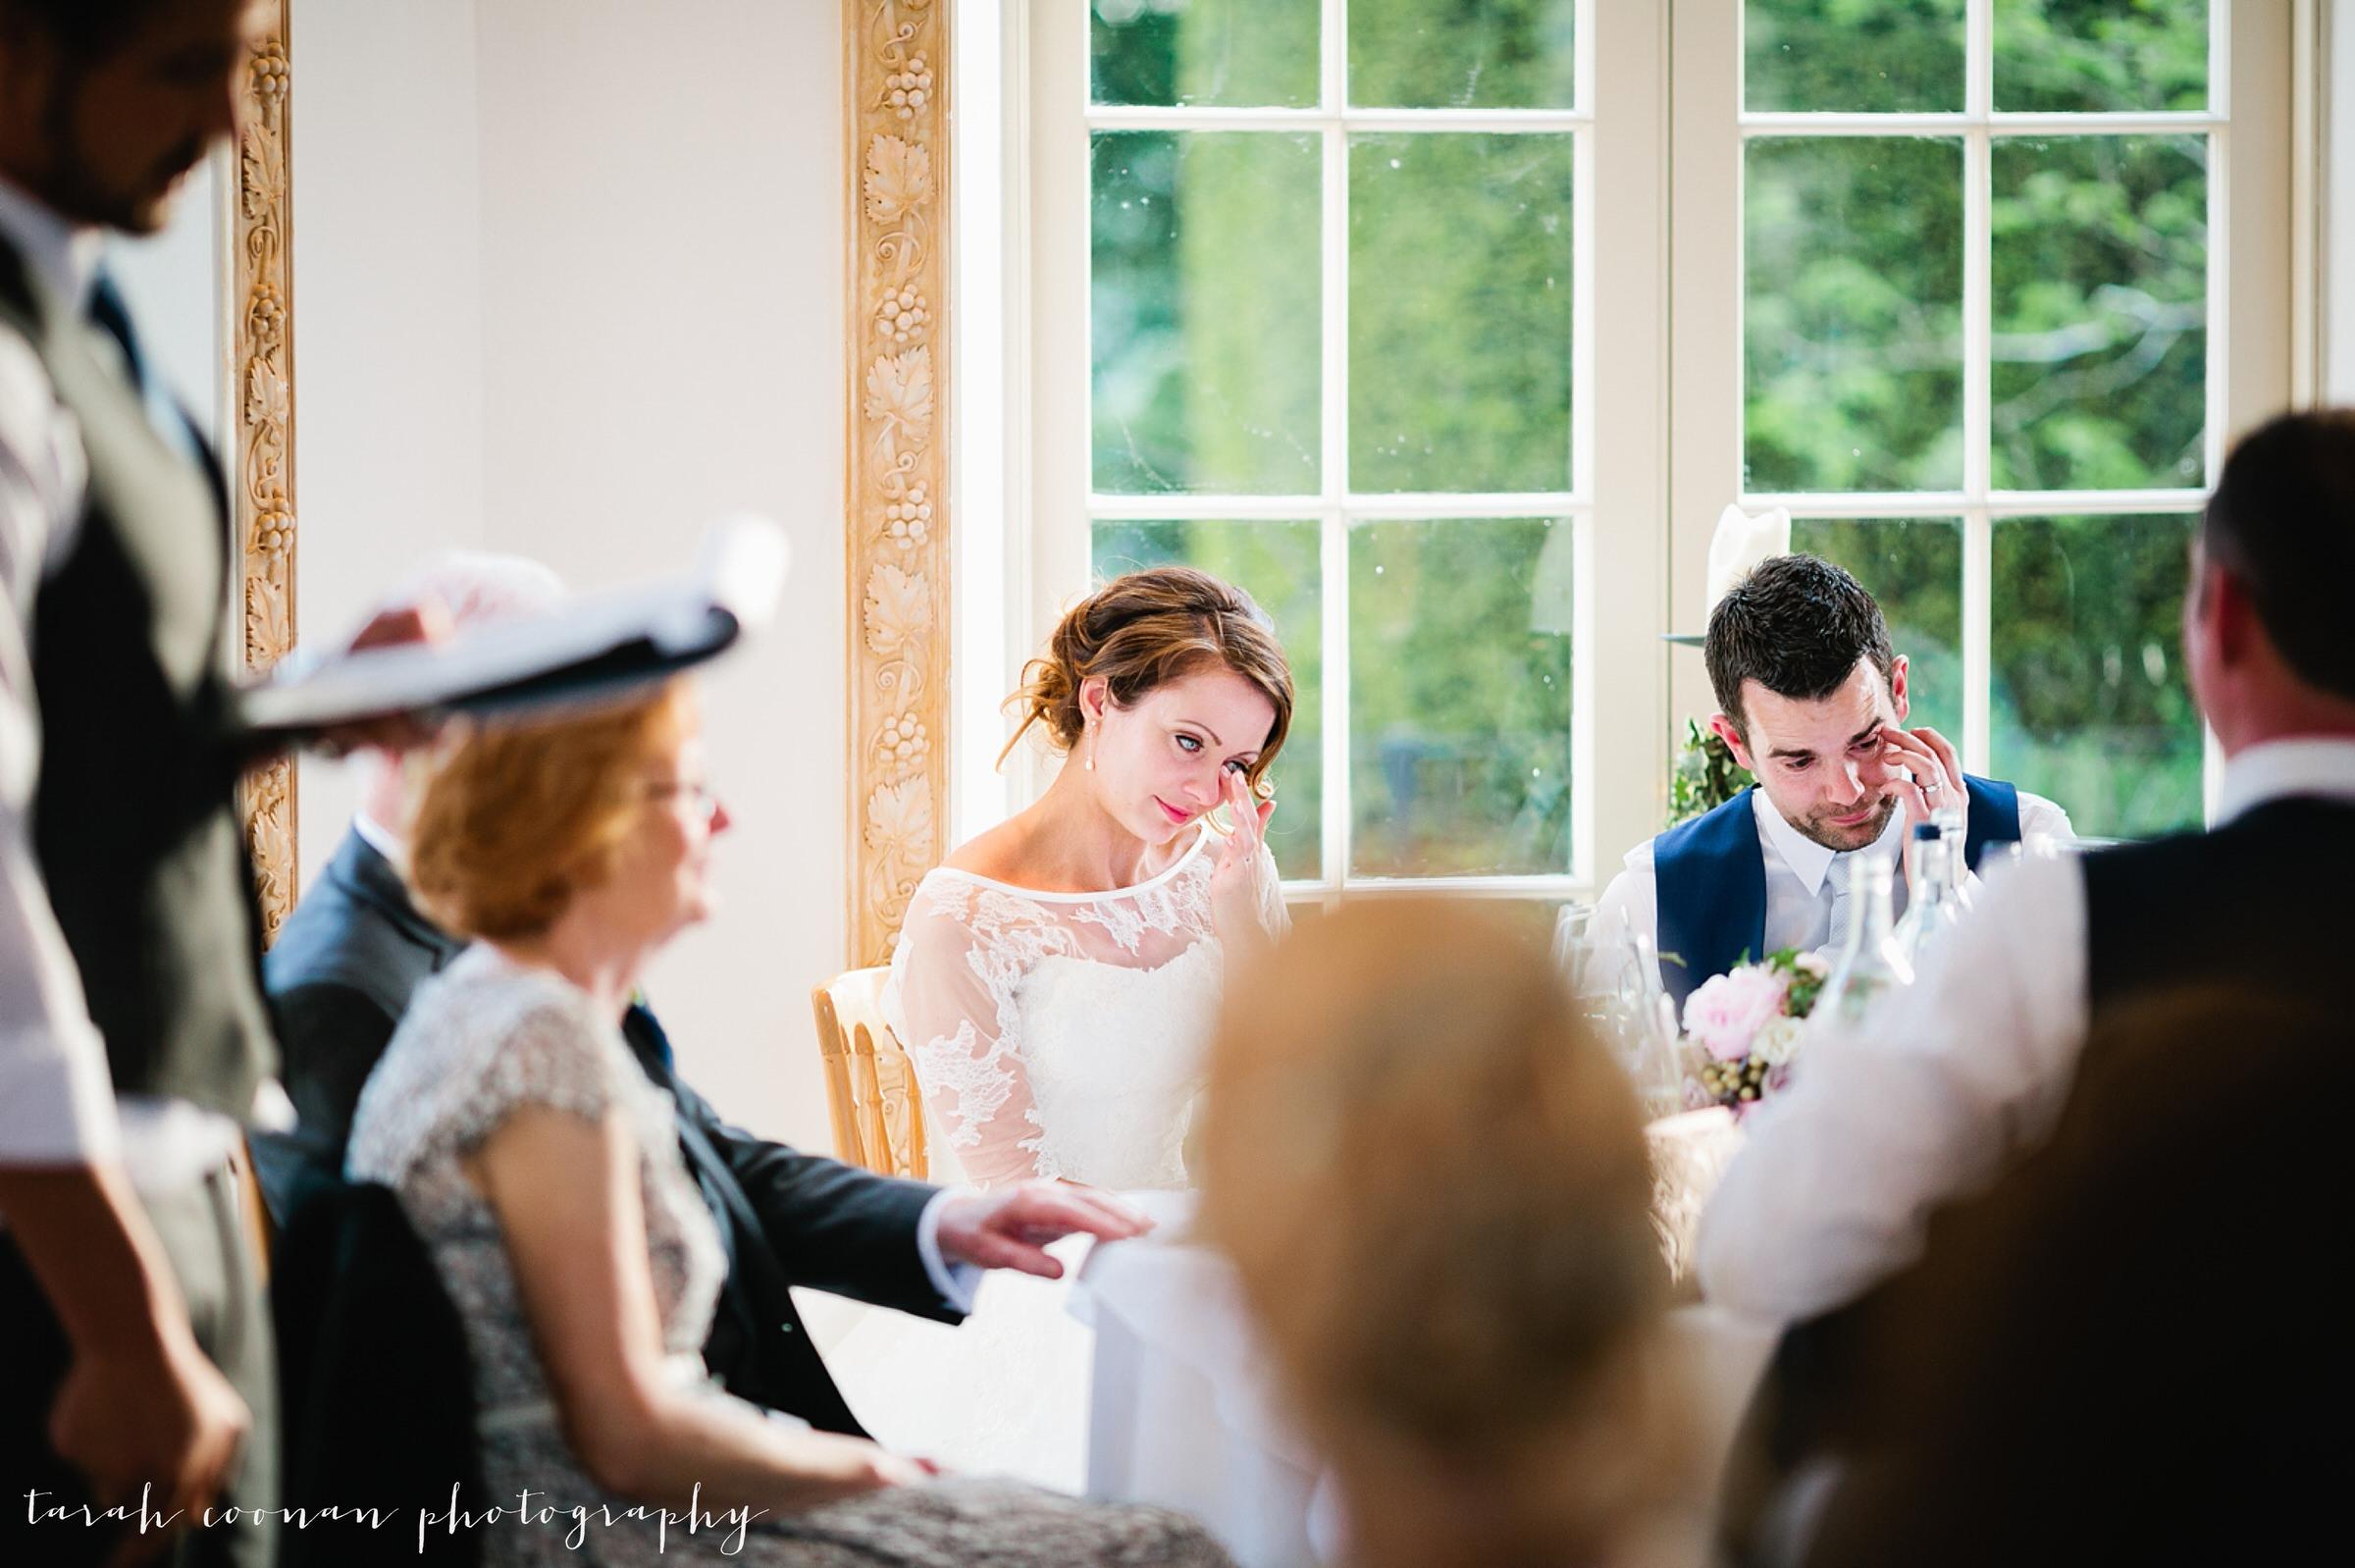 northbrook-park-wedding-photographer_085